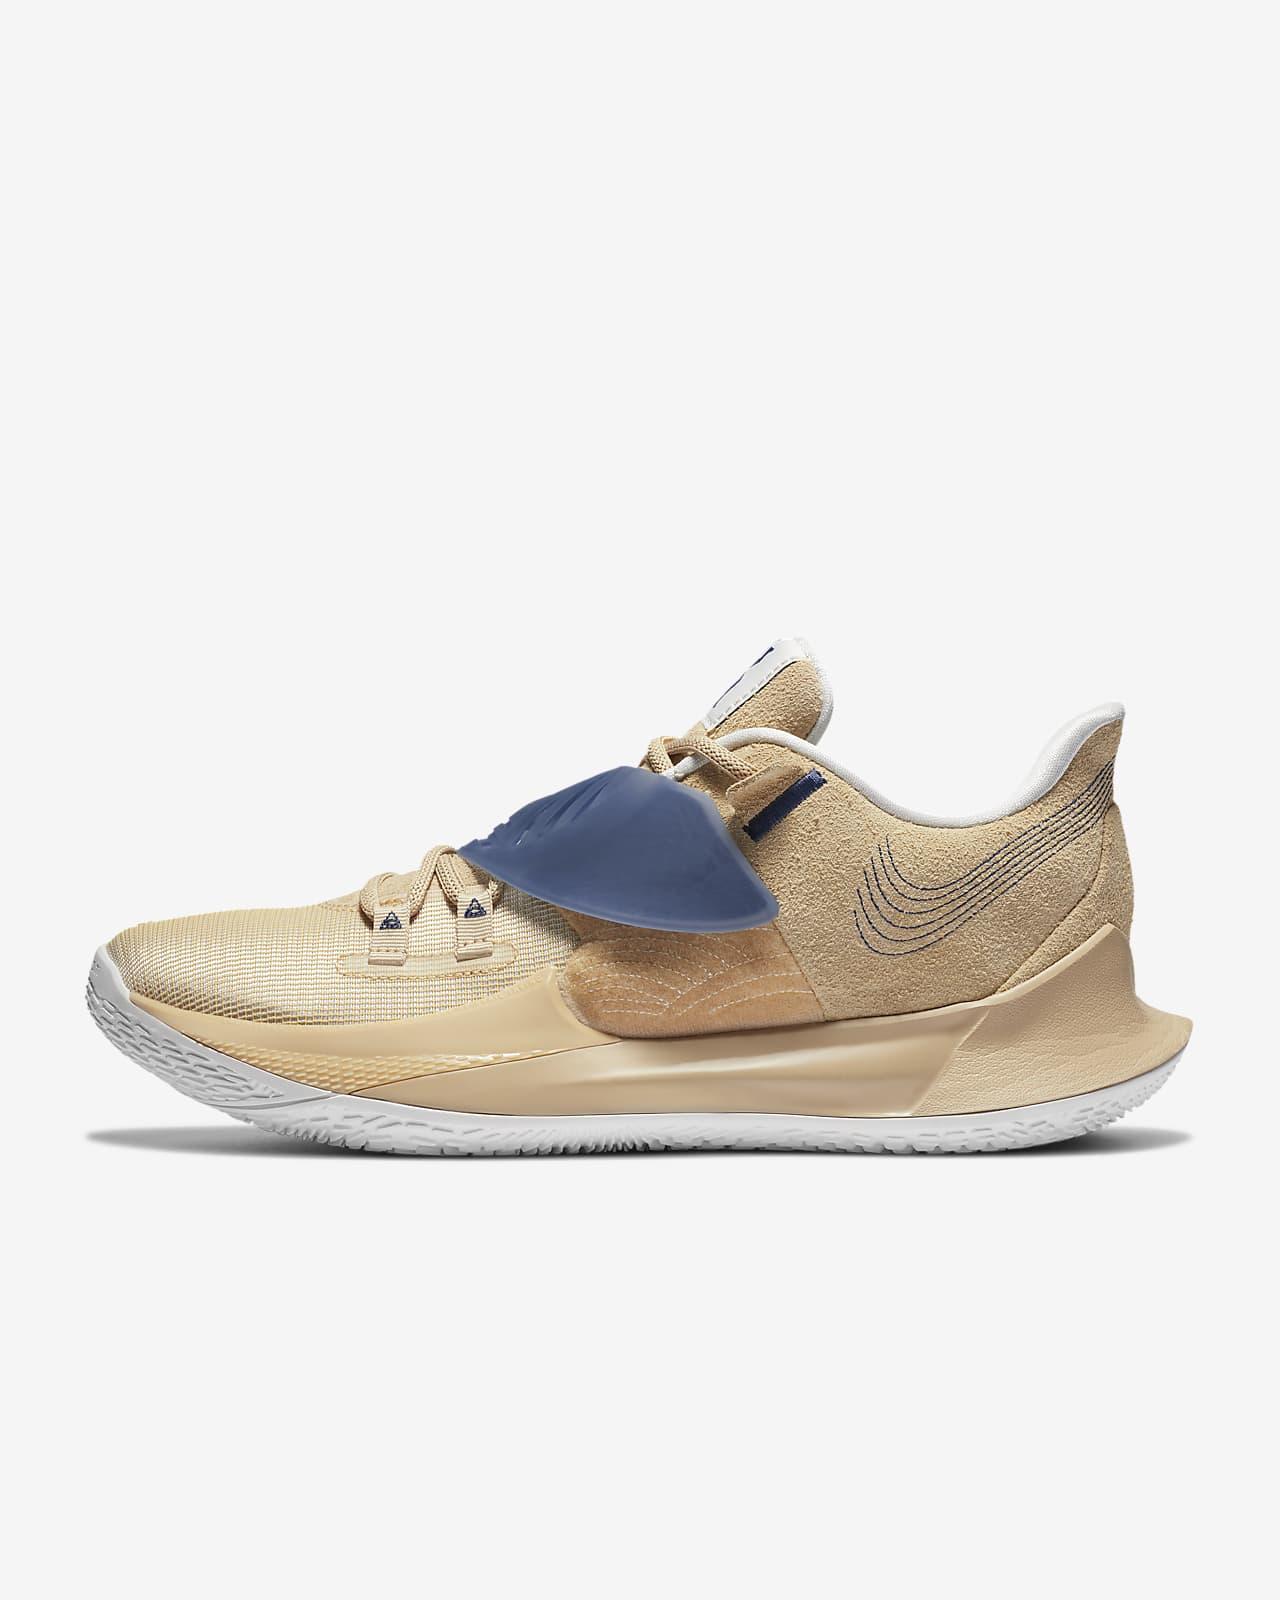 "Kyrie Low 3 ""Sashiko"" Basketball Shoe"